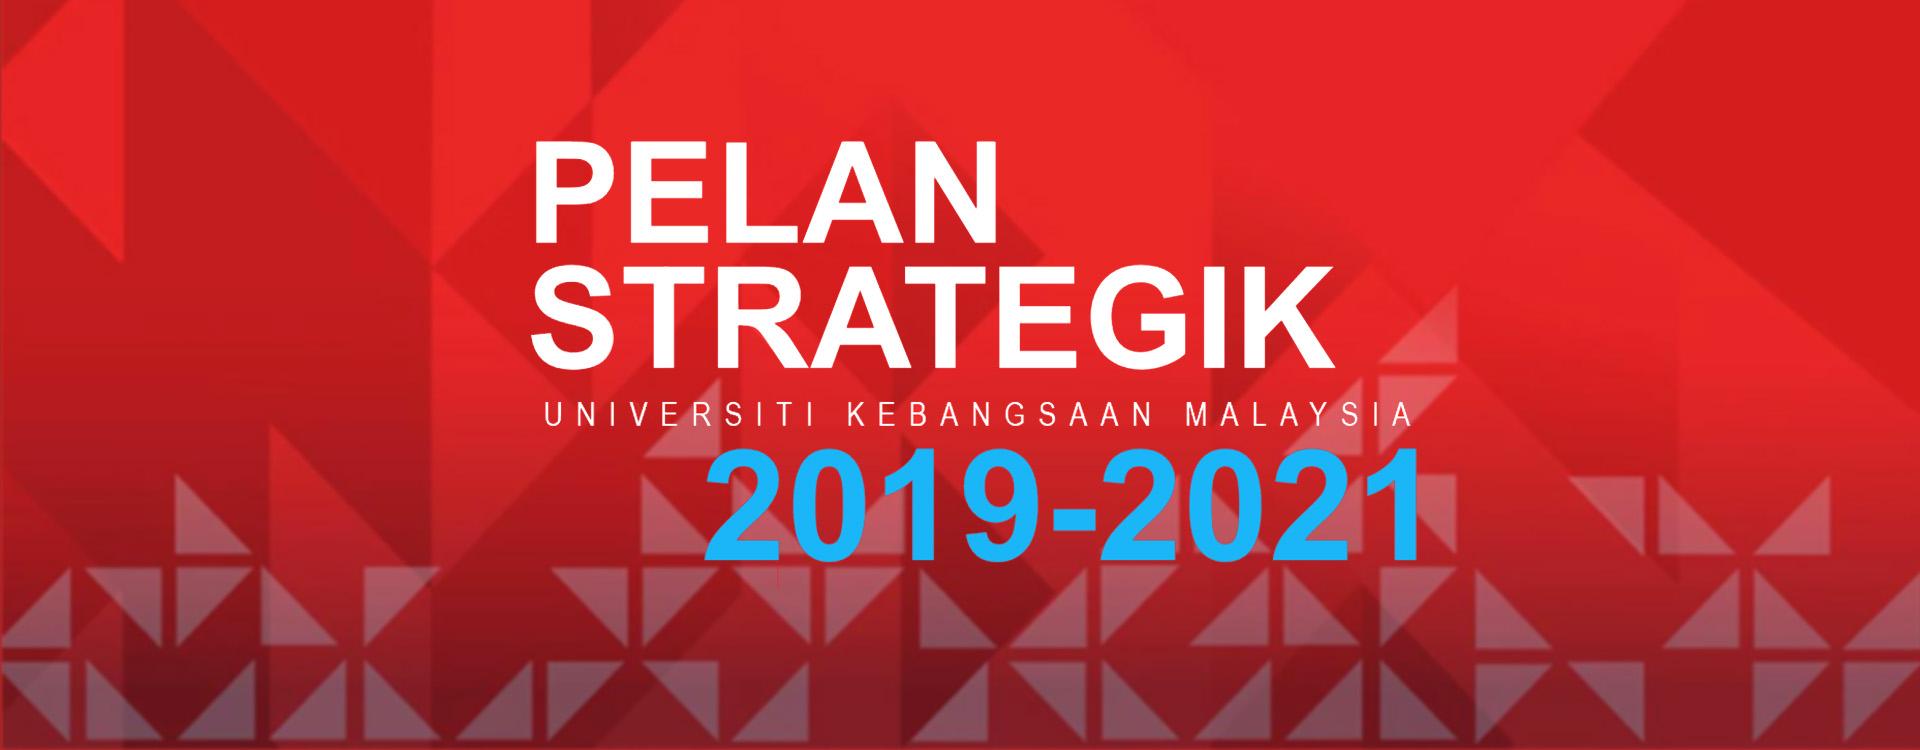 Pelan Strategik UKM 2019-2021